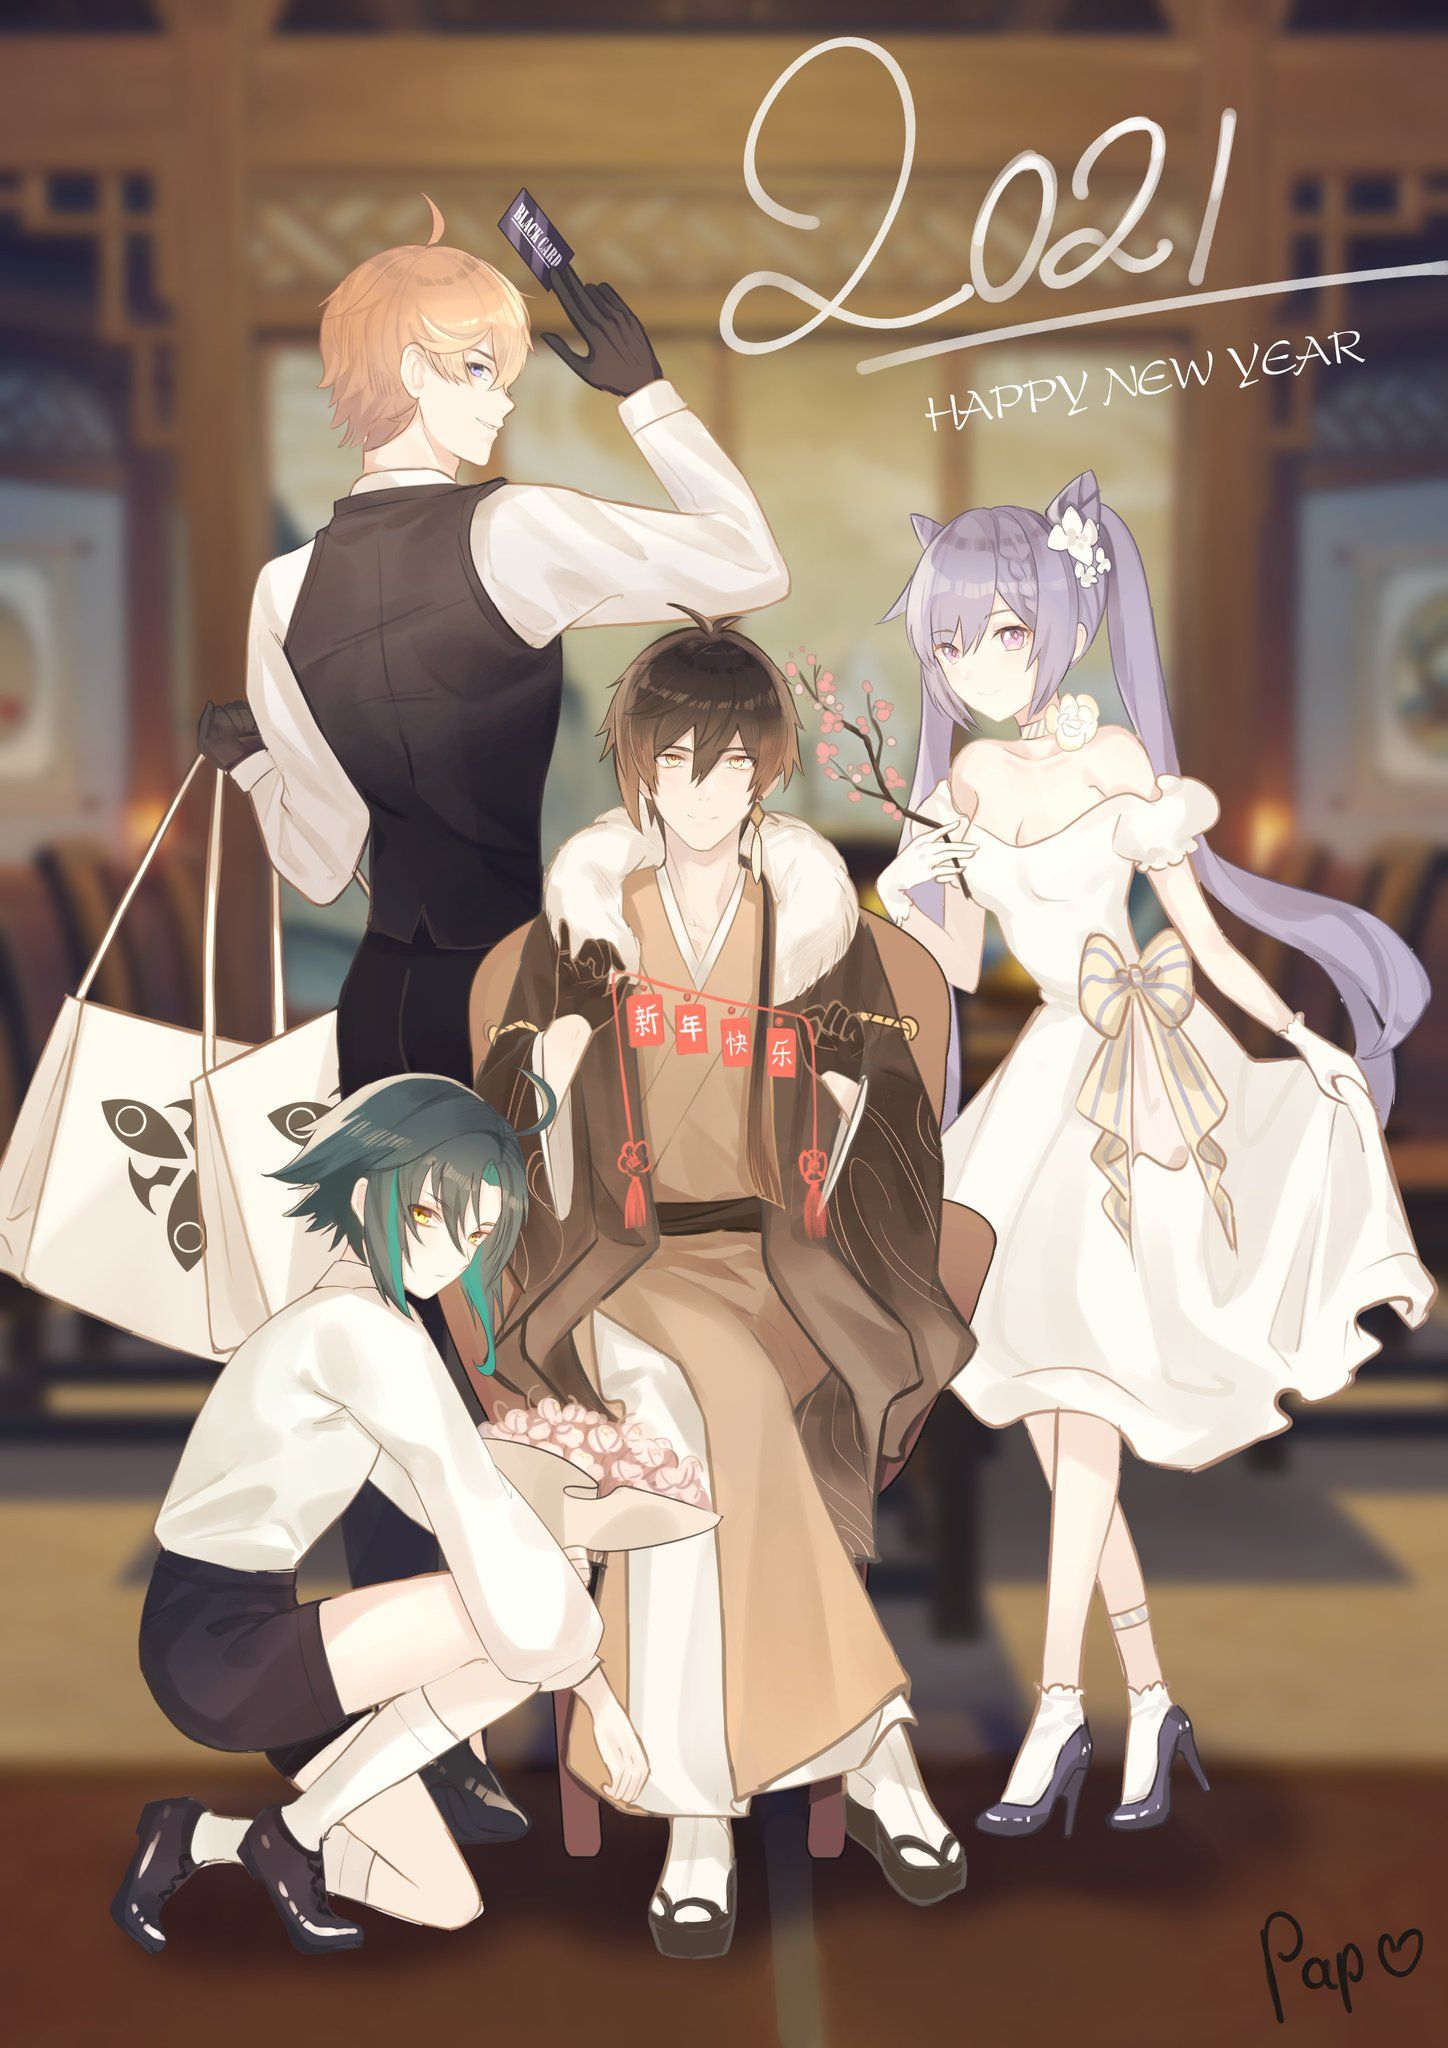 Papu Happy New Year 2021 On Twitter In 2021 Genshin Impact Ganyu Keqing Anime new year wallpaper 2021